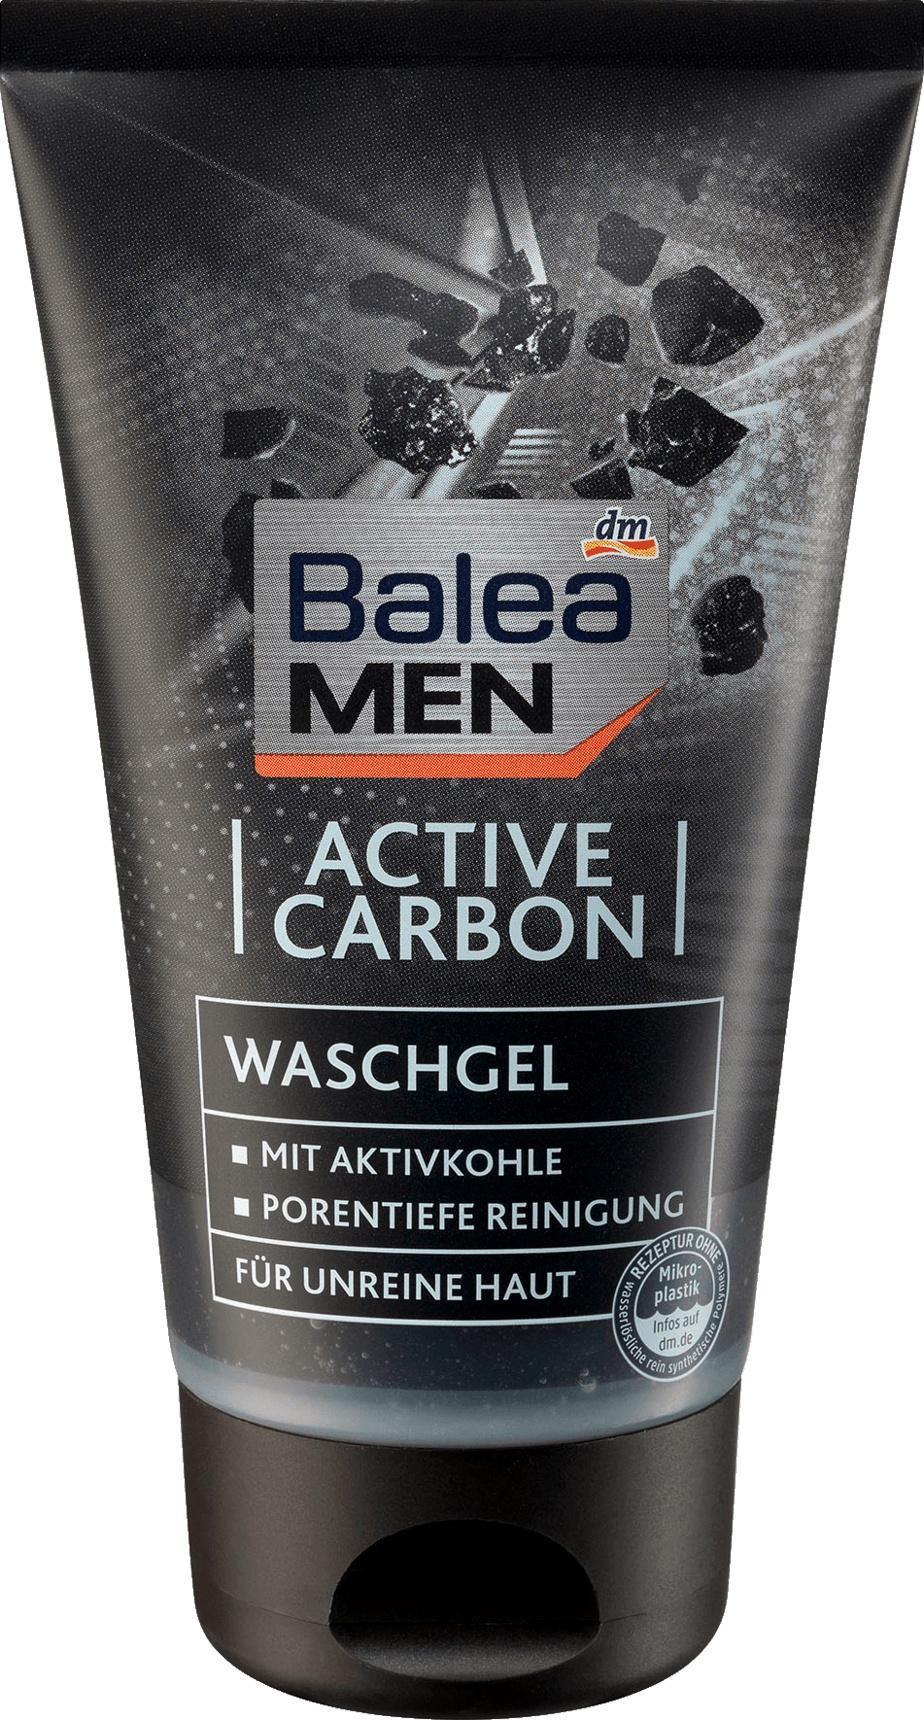 Balea MEN  Active Carbon Waschgel